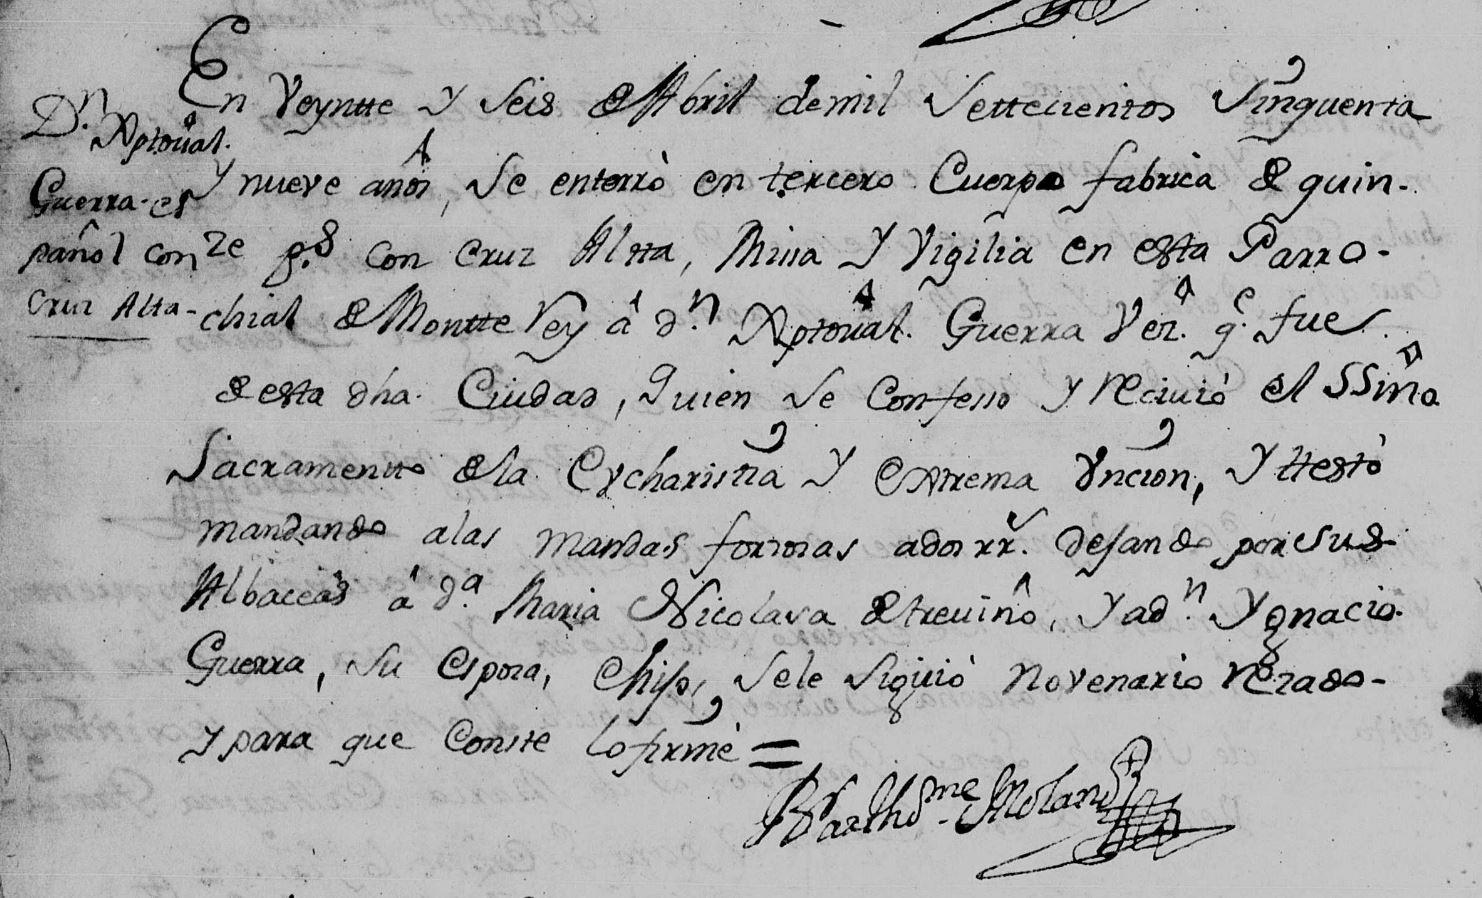 Cristobal Guerra Cañamar Death Record FamilySearch, Monterrey, N.L. Catherdral 1759 Pg. 72